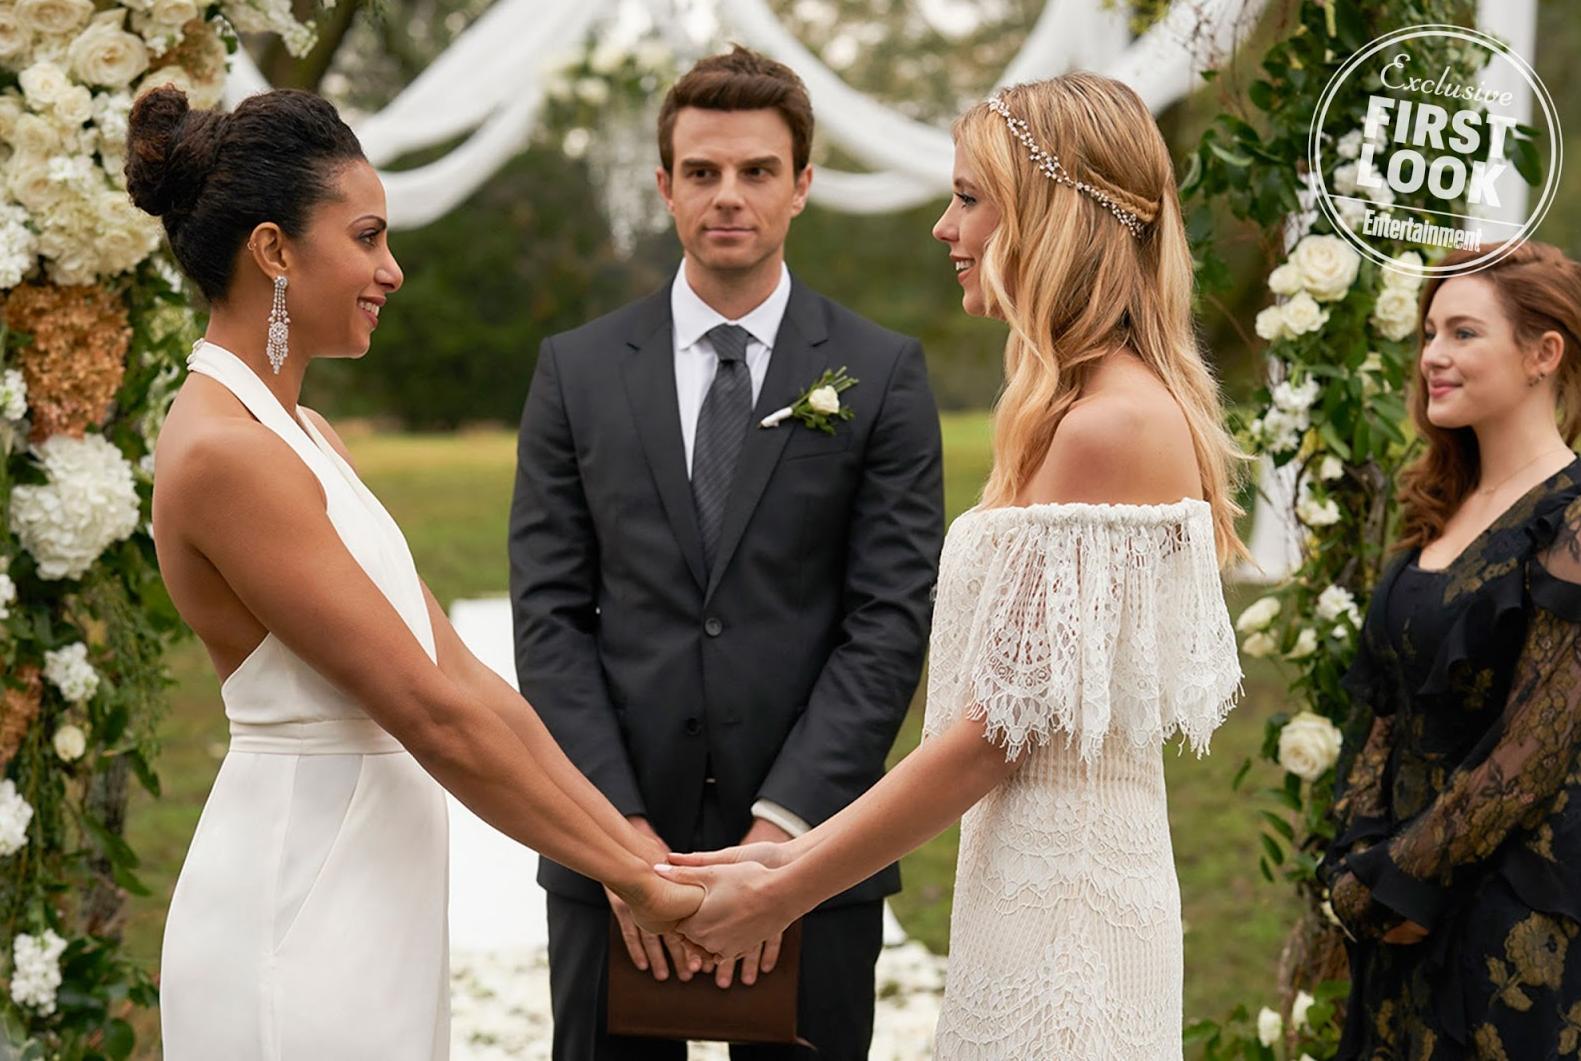 Ślub Freyi i Keelin